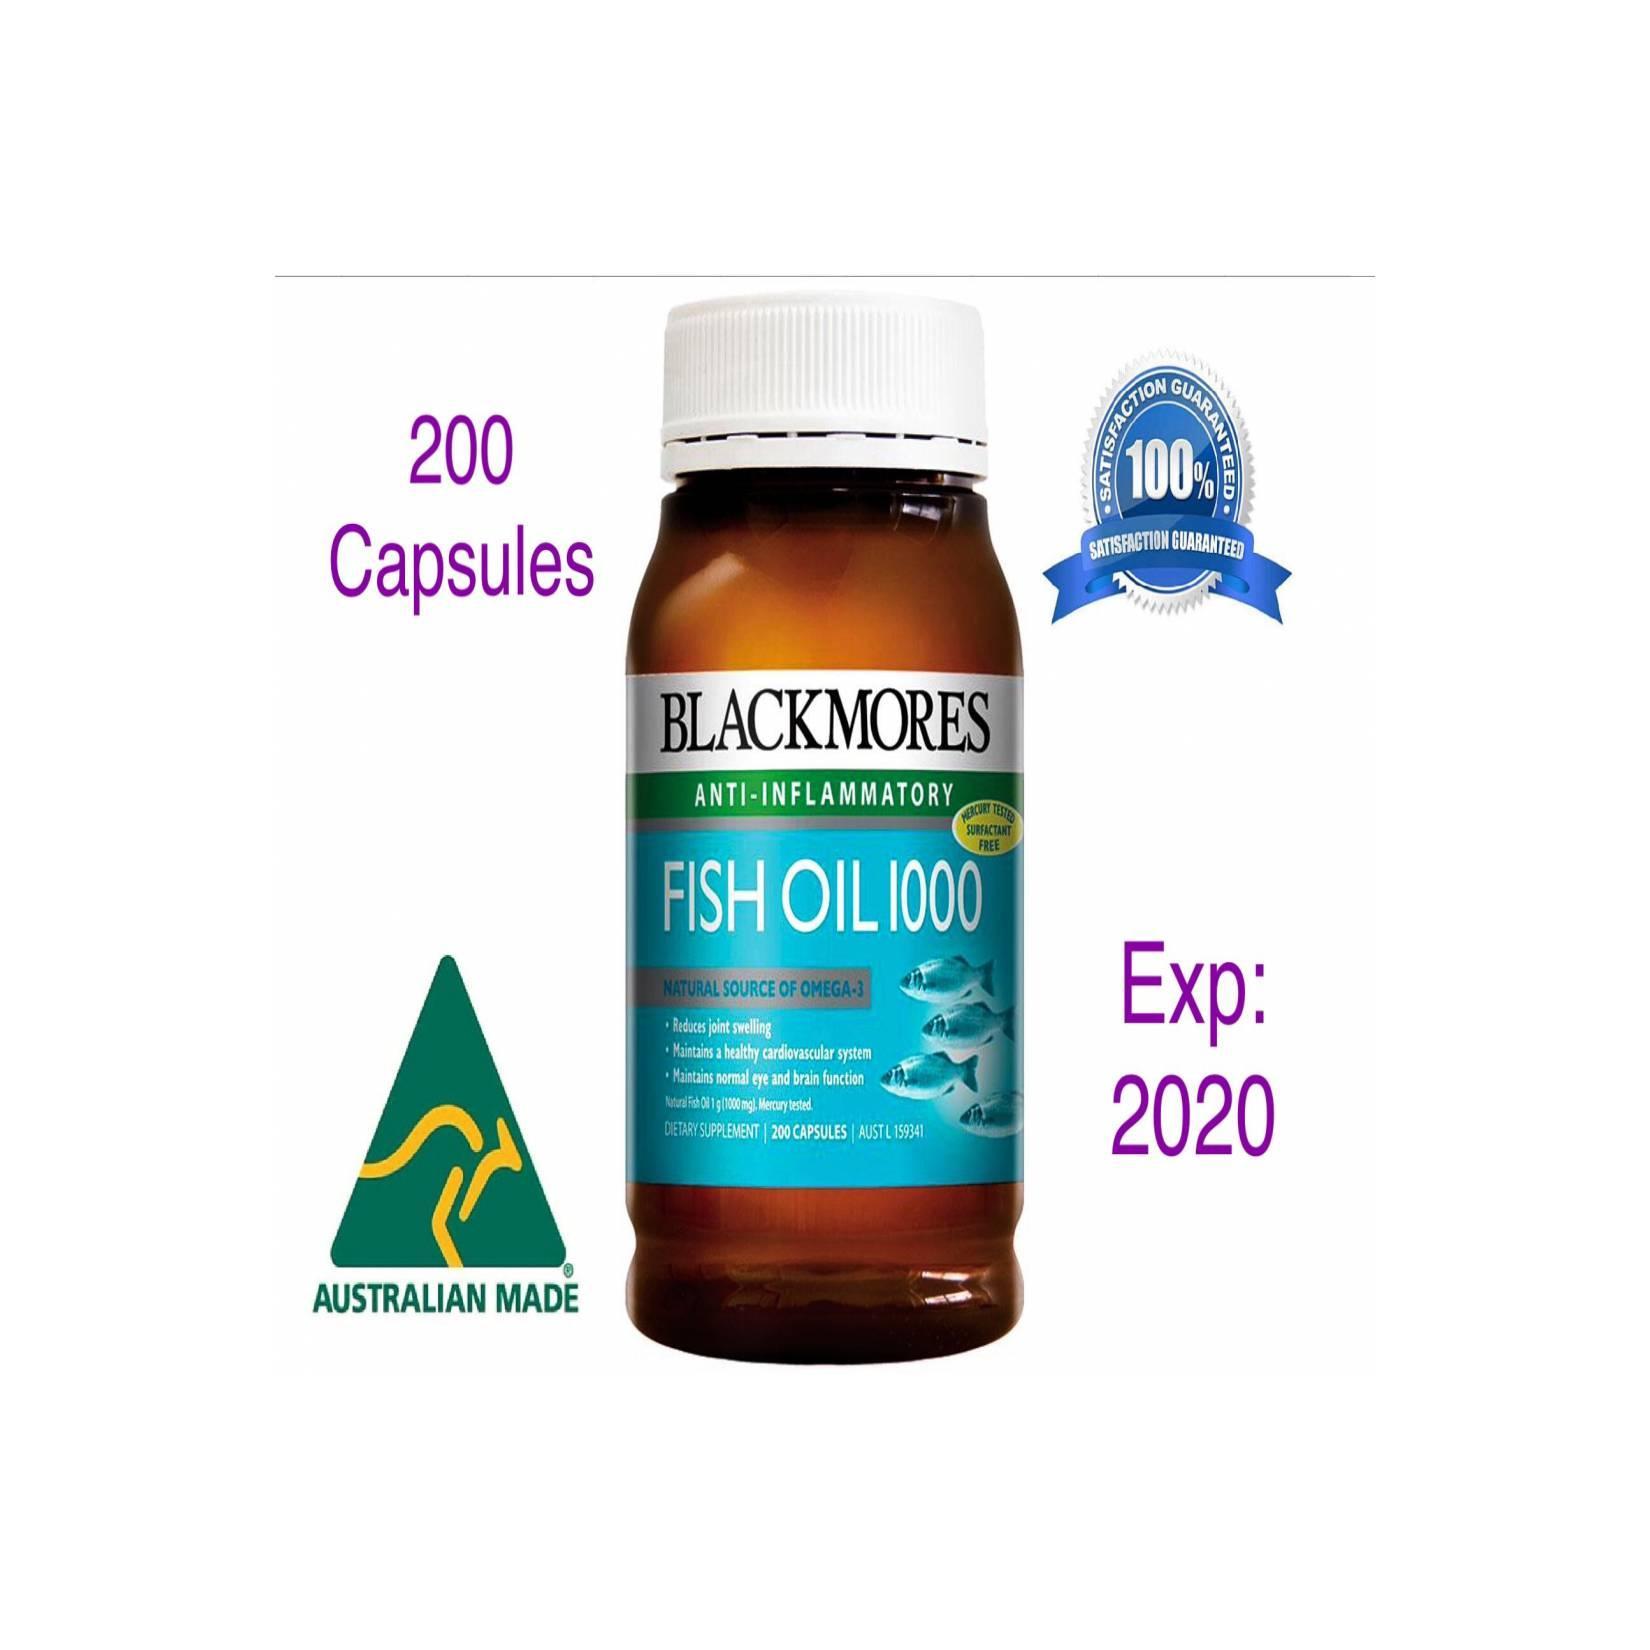 Harga Blackmores Pregnancy Breastfeedin Menyusui 120 Capsule Minyak Ikan Omega 3 Black Mores Isi 400 Fish Oil 1000 Dietary Supplement 200